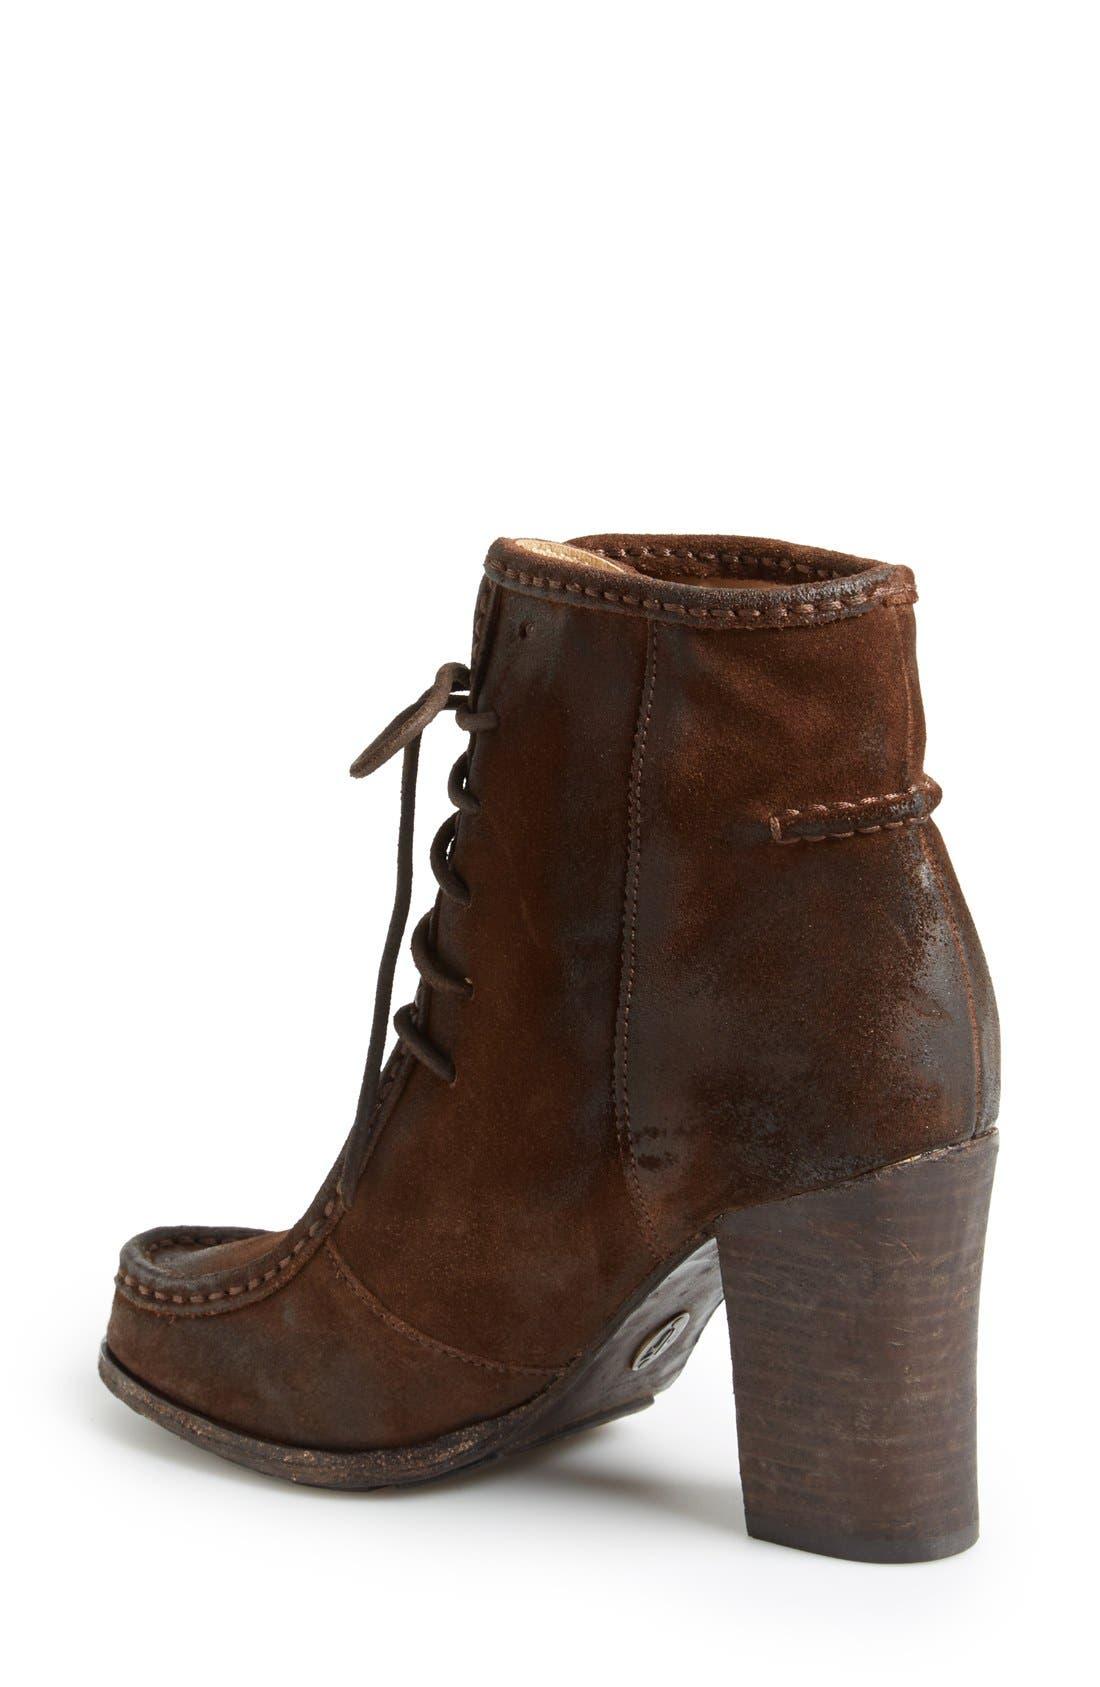 Alternate Image 2  - Frye 'Parker' Suede Moc Toe Ankle Boot (Women)